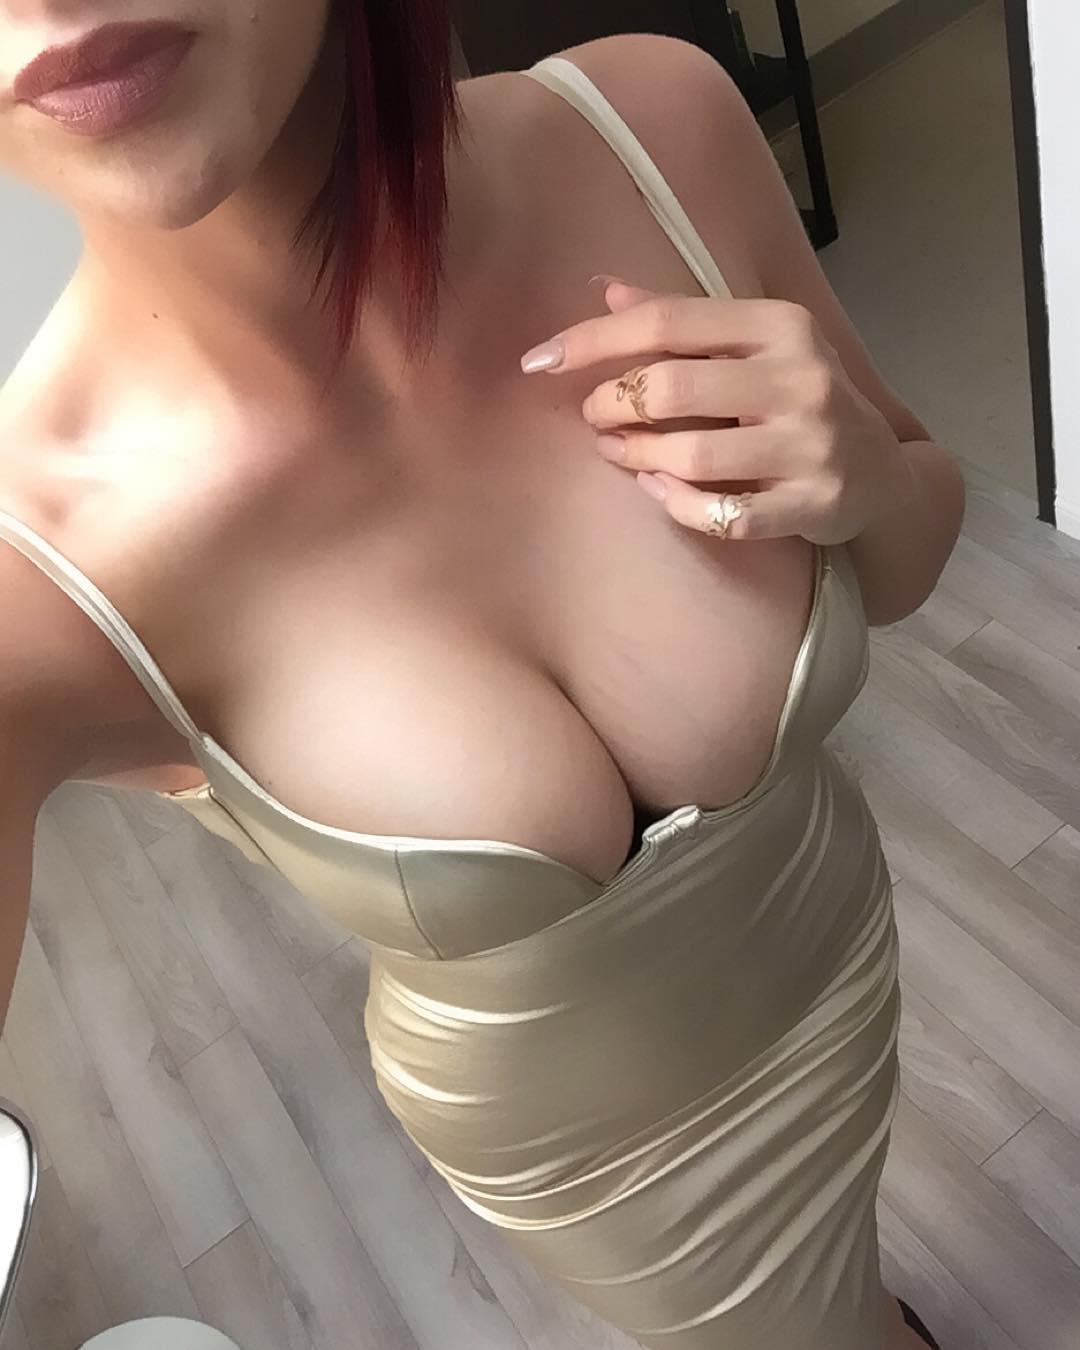 mature woman nude sexy ass